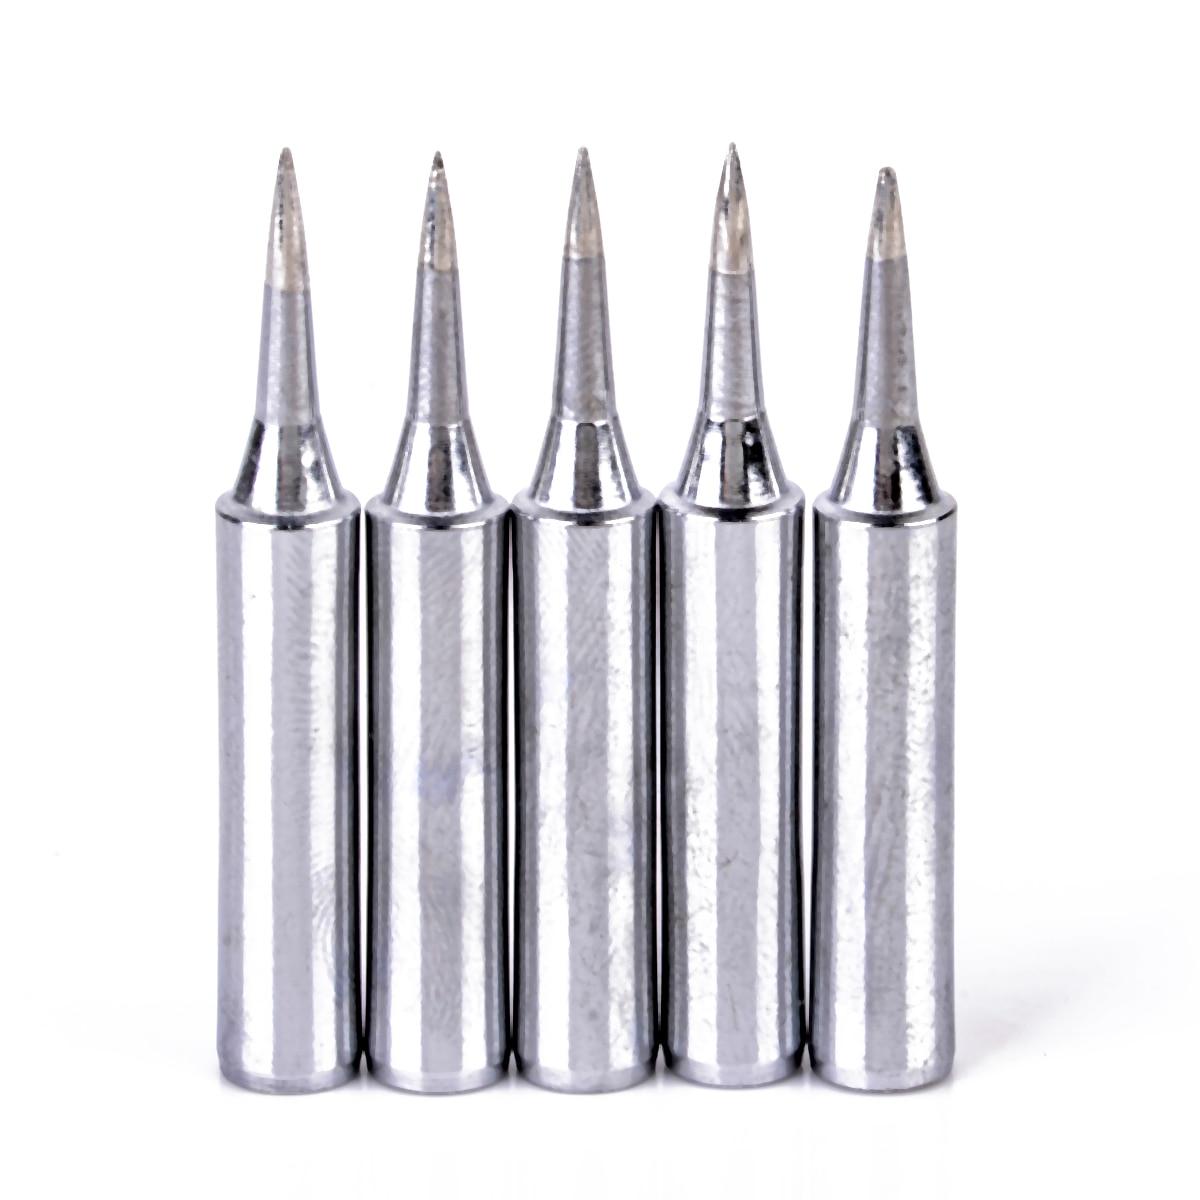 5pcs 900m-T-I Soldering Iron Tips Lead Free Replacement Soldering Tools Solder Iron Tips Head For Soldering Repair Tool